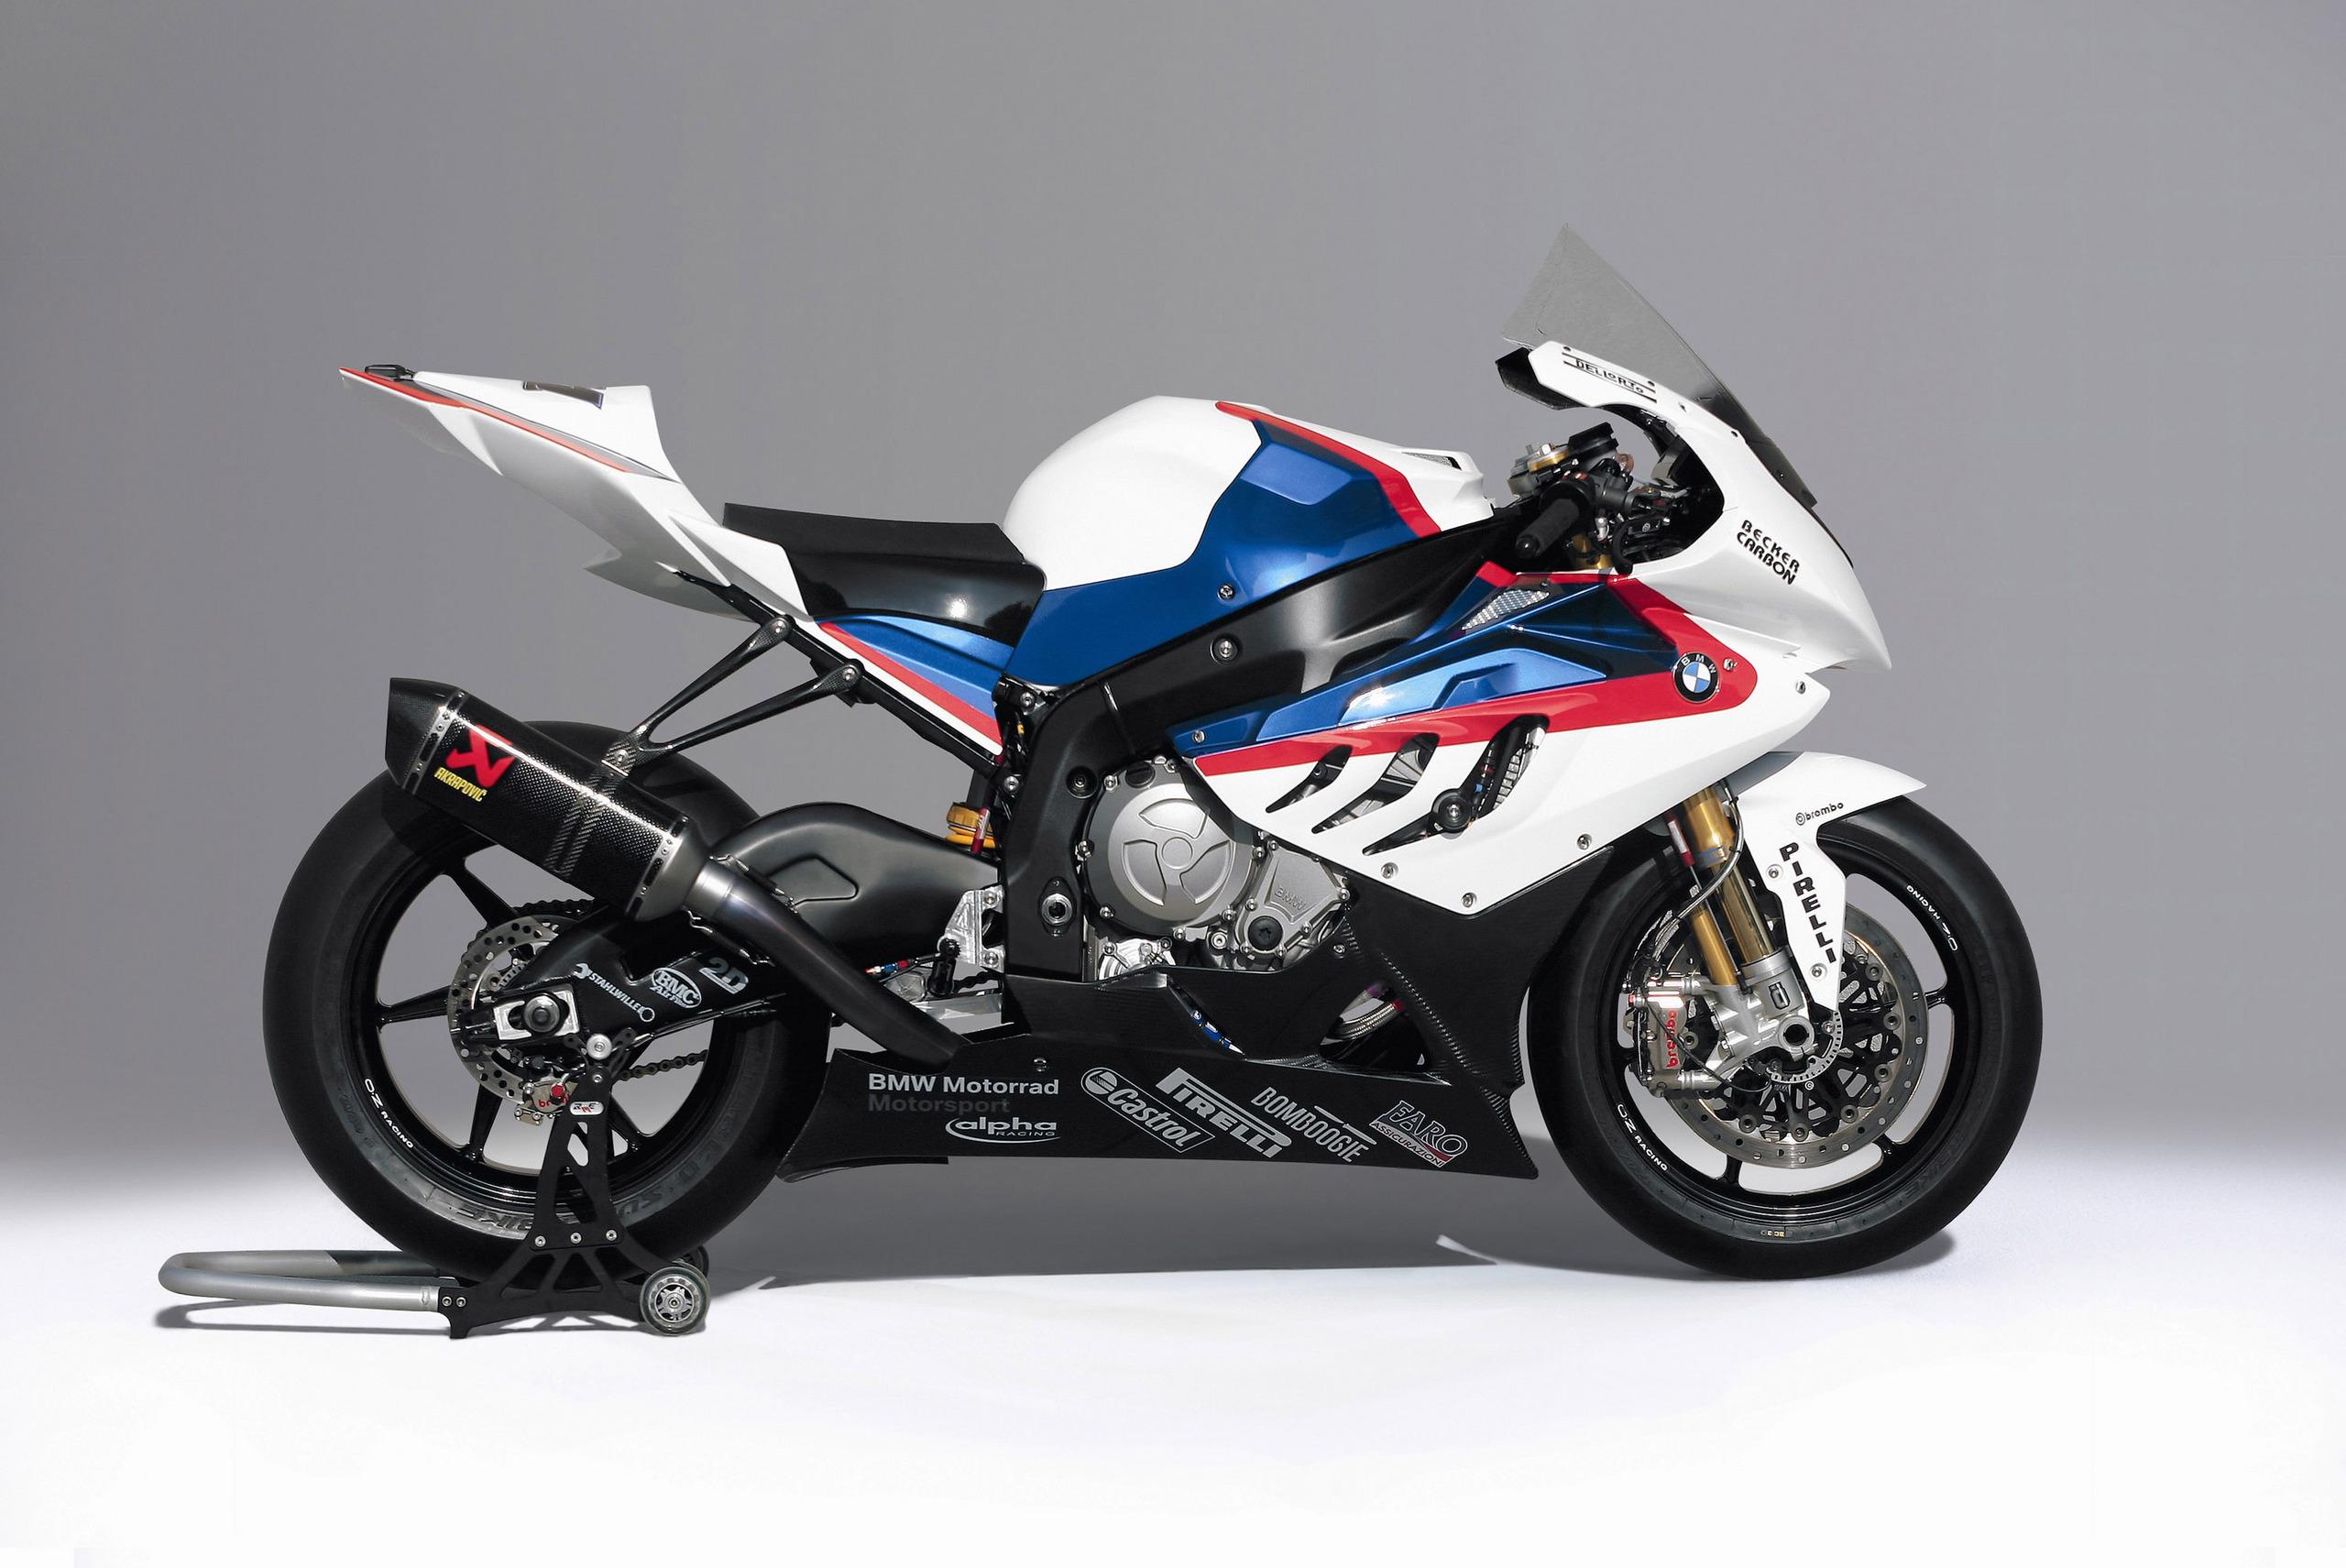 Bmw S 1000 Rr Sbk Motorcycles Photo 24459075 Fanpop